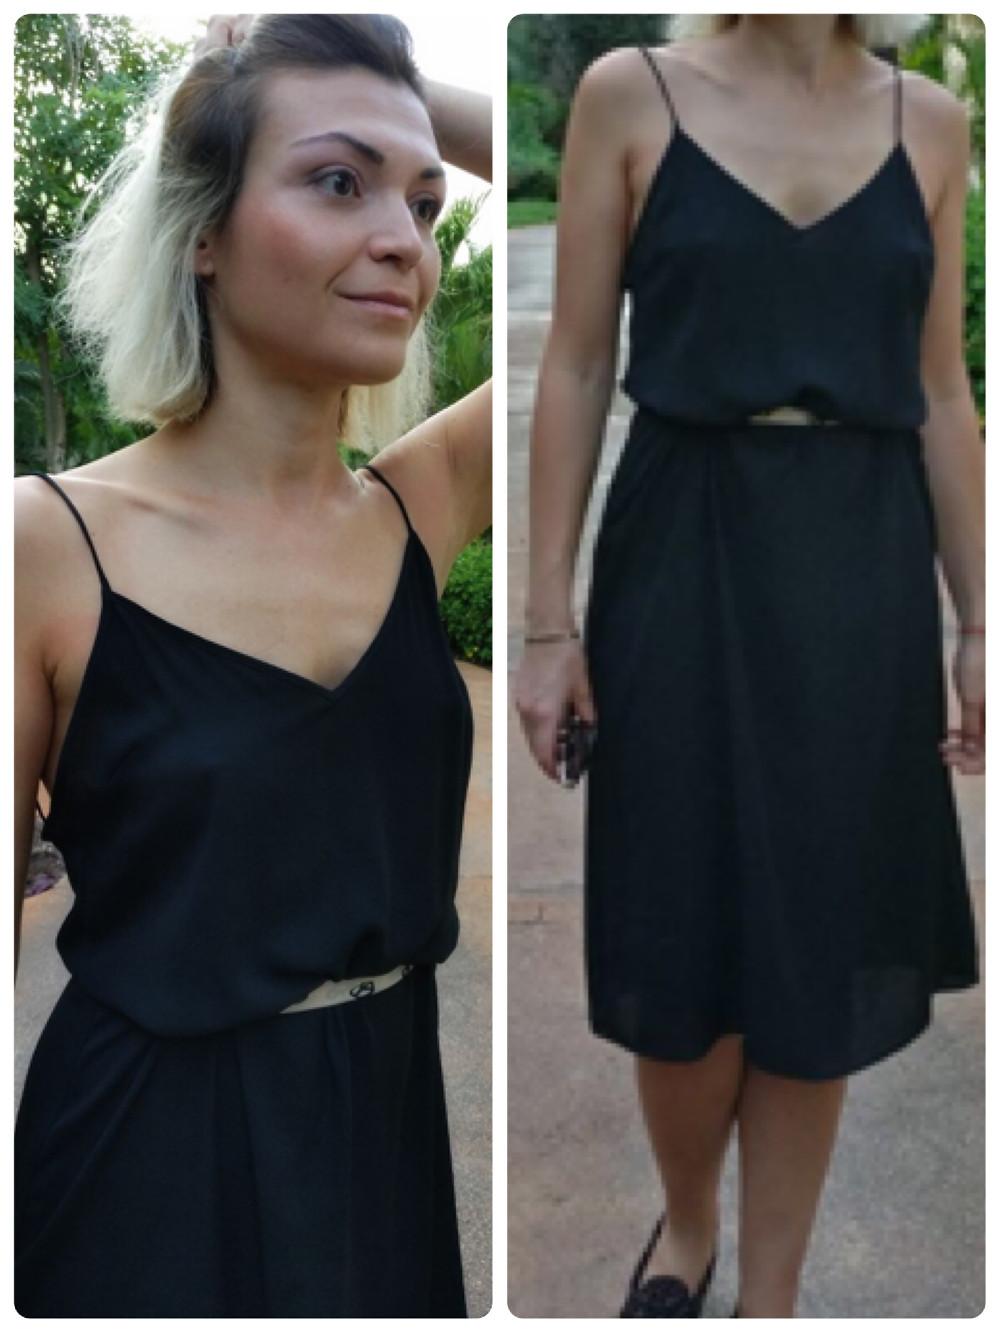 Dress: Mango Belt/Scarf: Moschino Shoes: Tods